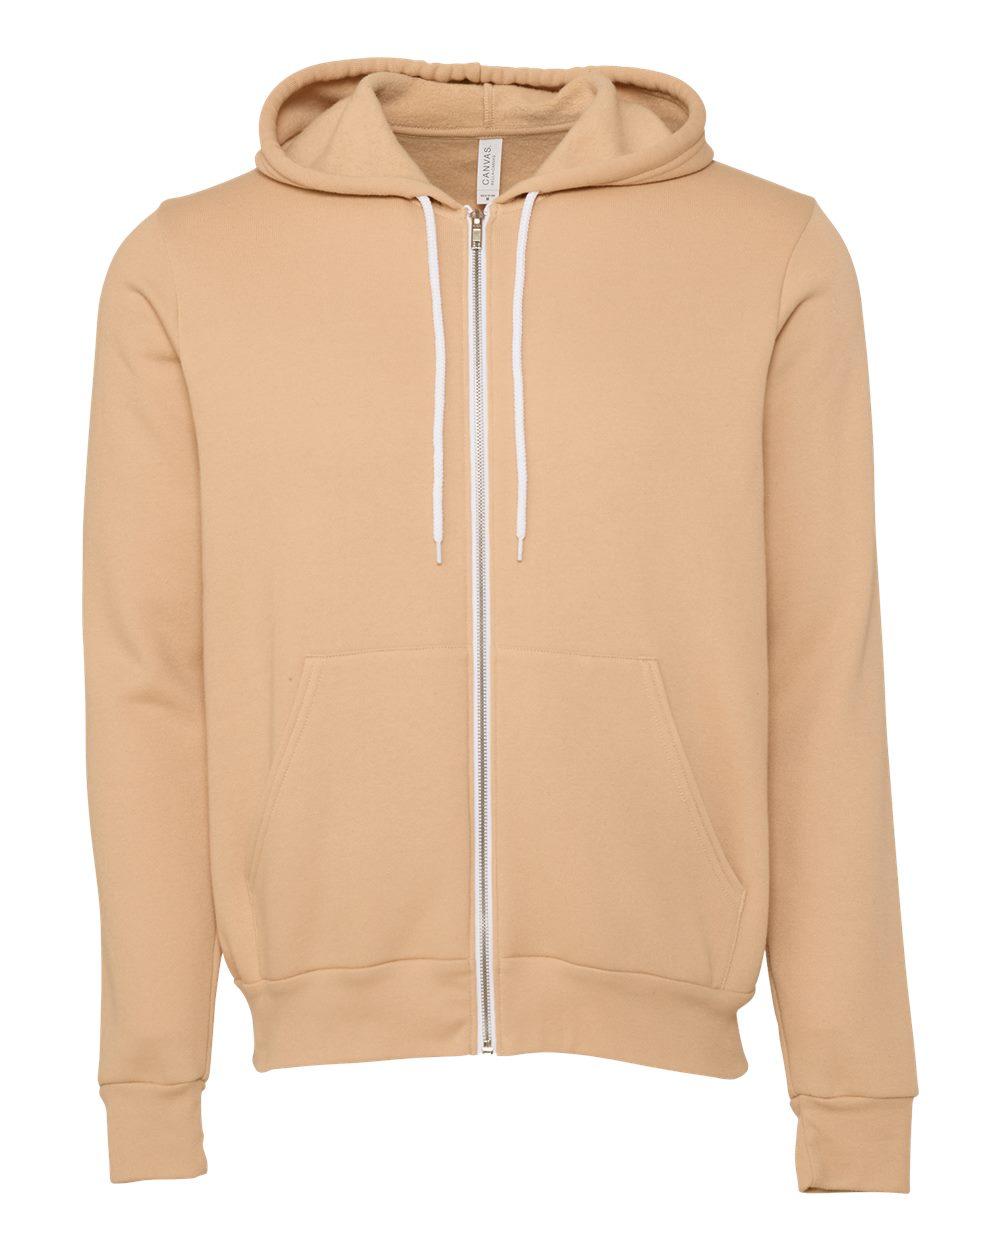 Bella-Canvas-Unisex-Full-Zip-Up-Hooded-Sweatshirt-Blank-Hoodie-3739-up-to-3XL thumbnail 51